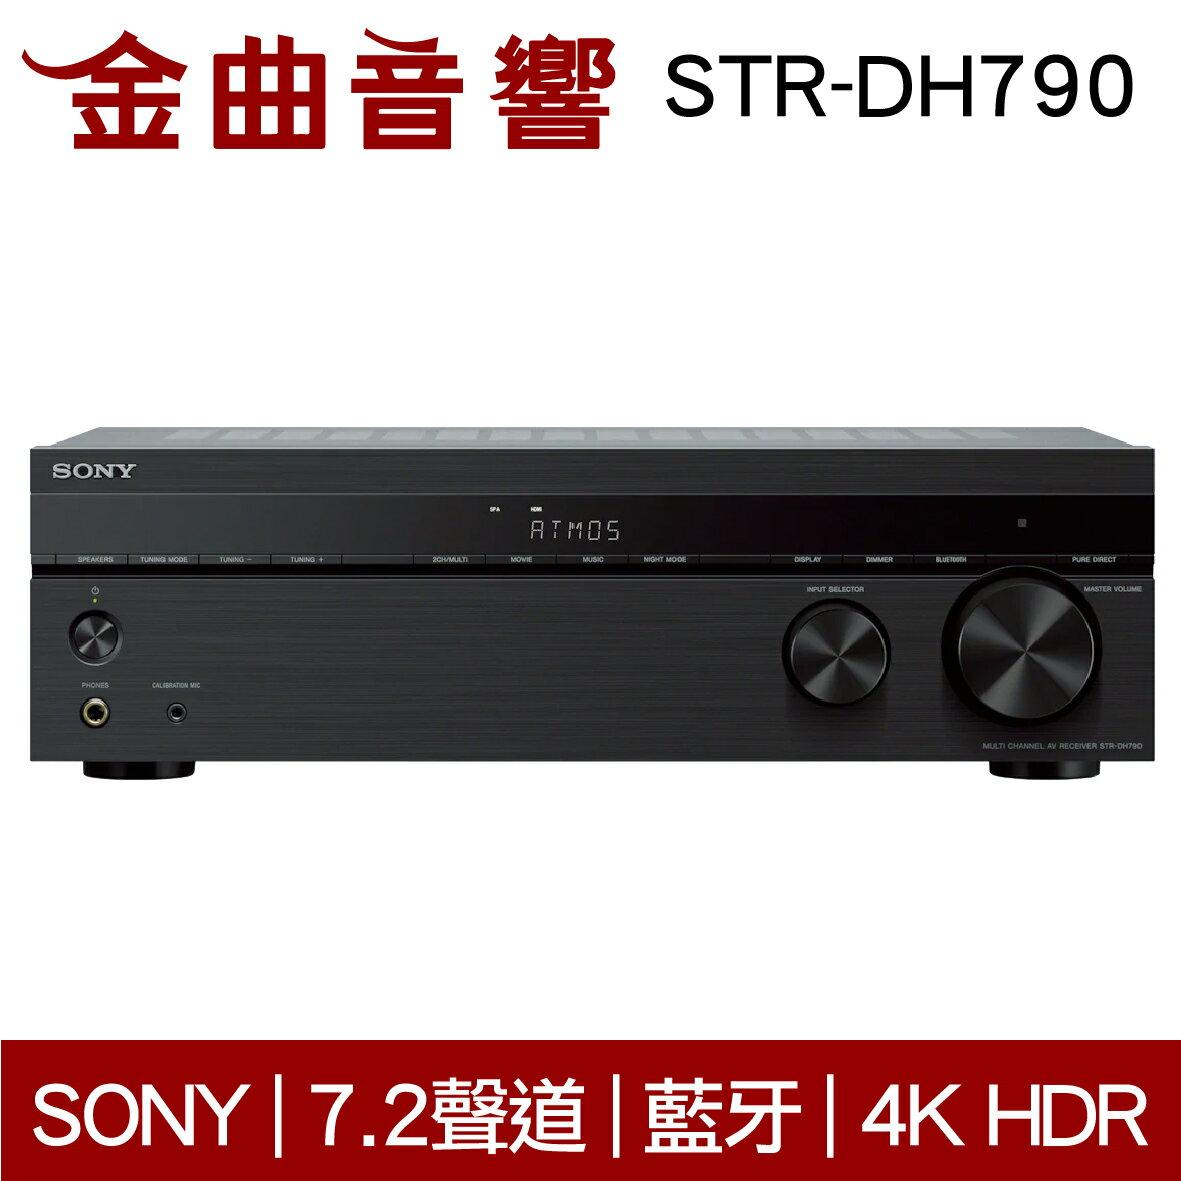 SONY 索尼 STR-DH790 7.2 聲道 AV 接收器 | 金曲音響